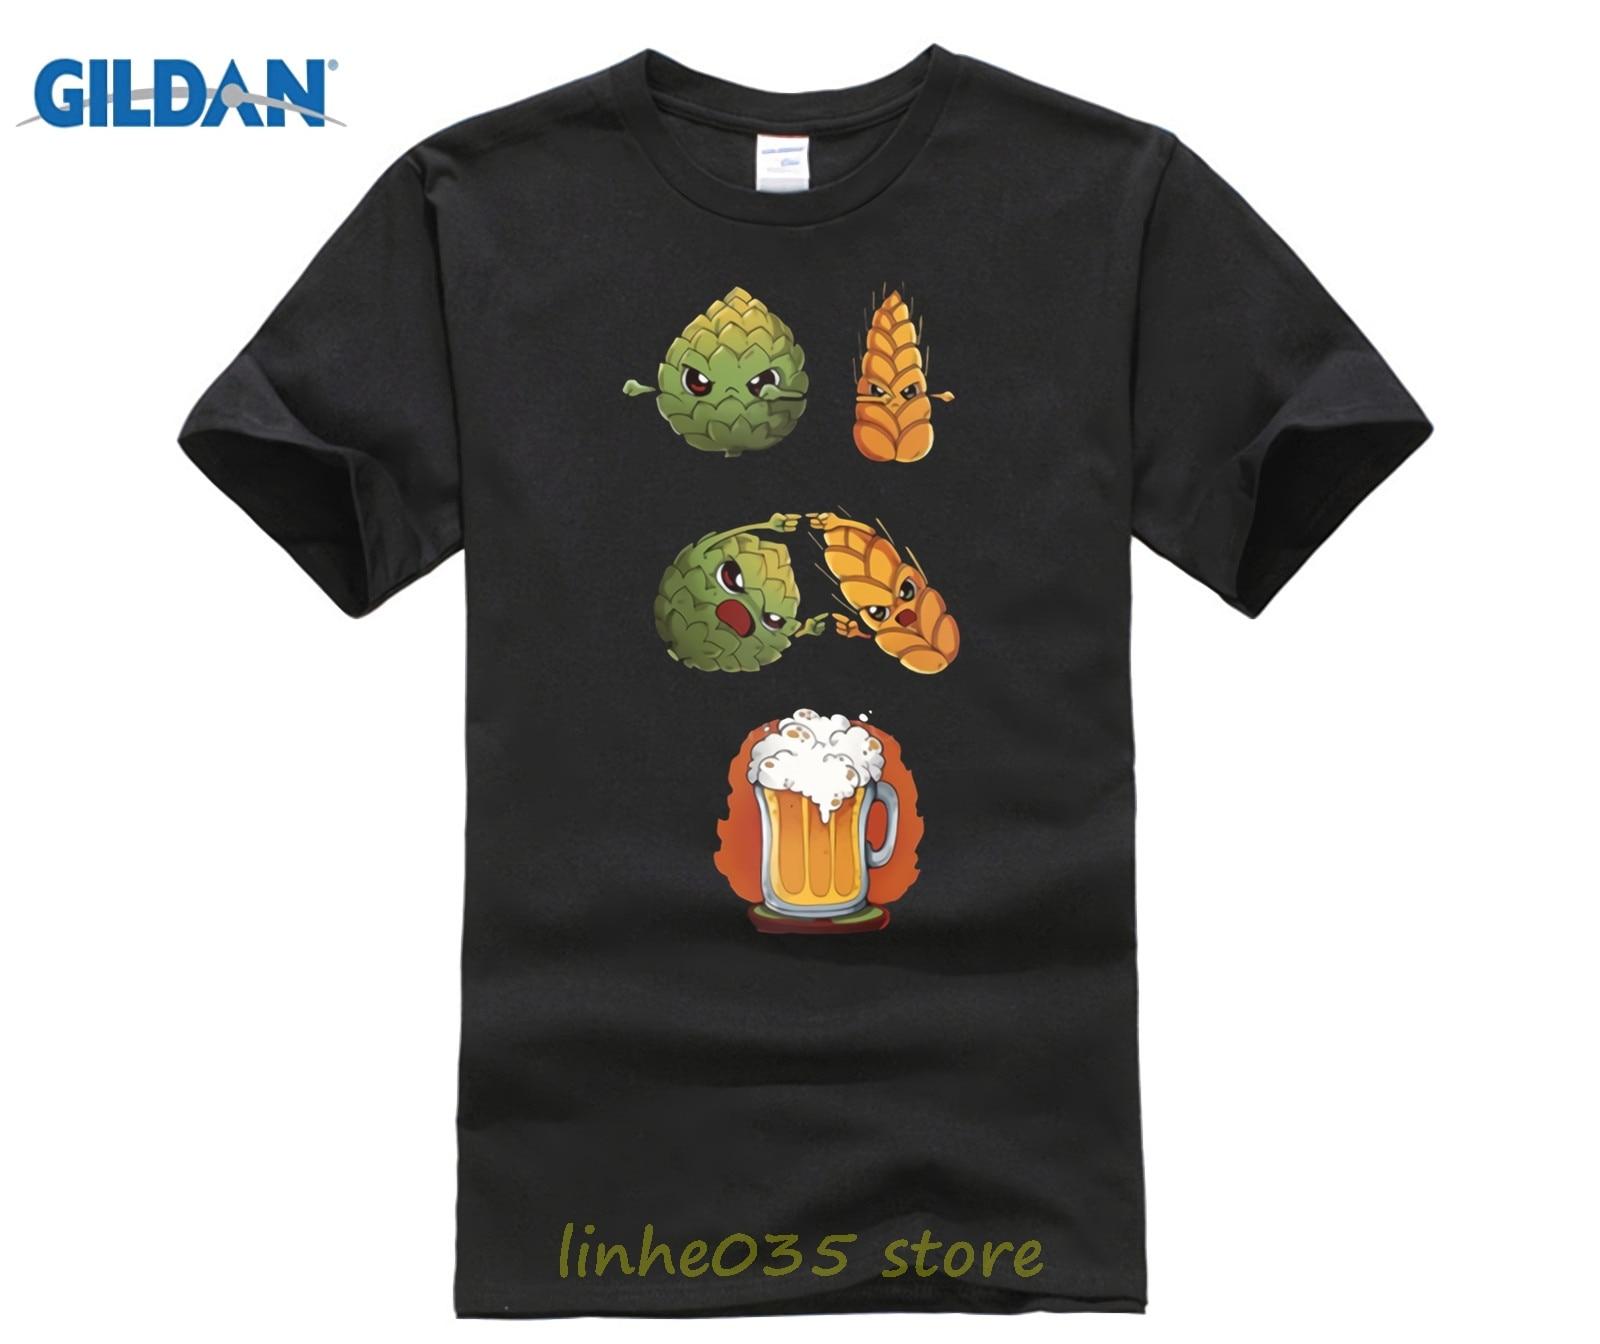 Anti-Wrinkle T-shirt Big Size For Men Beer Fusion Men's T Shirt Organic Cotton Cotton Tshirt Design Clothing Pop